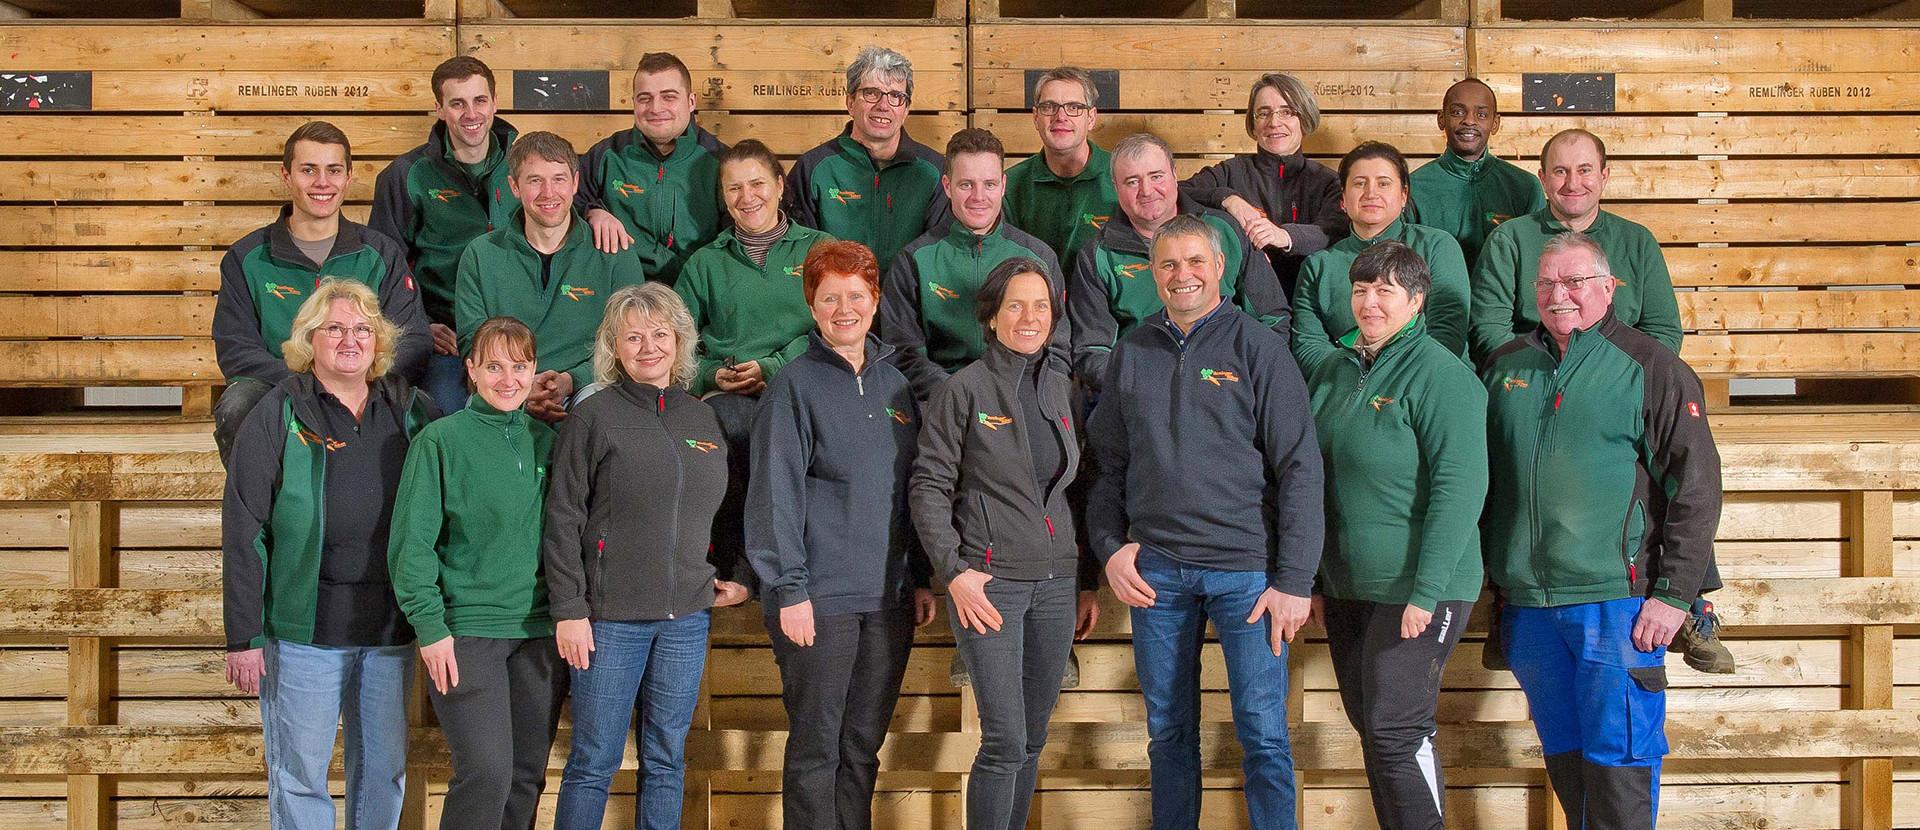 Das Remlinger-Team